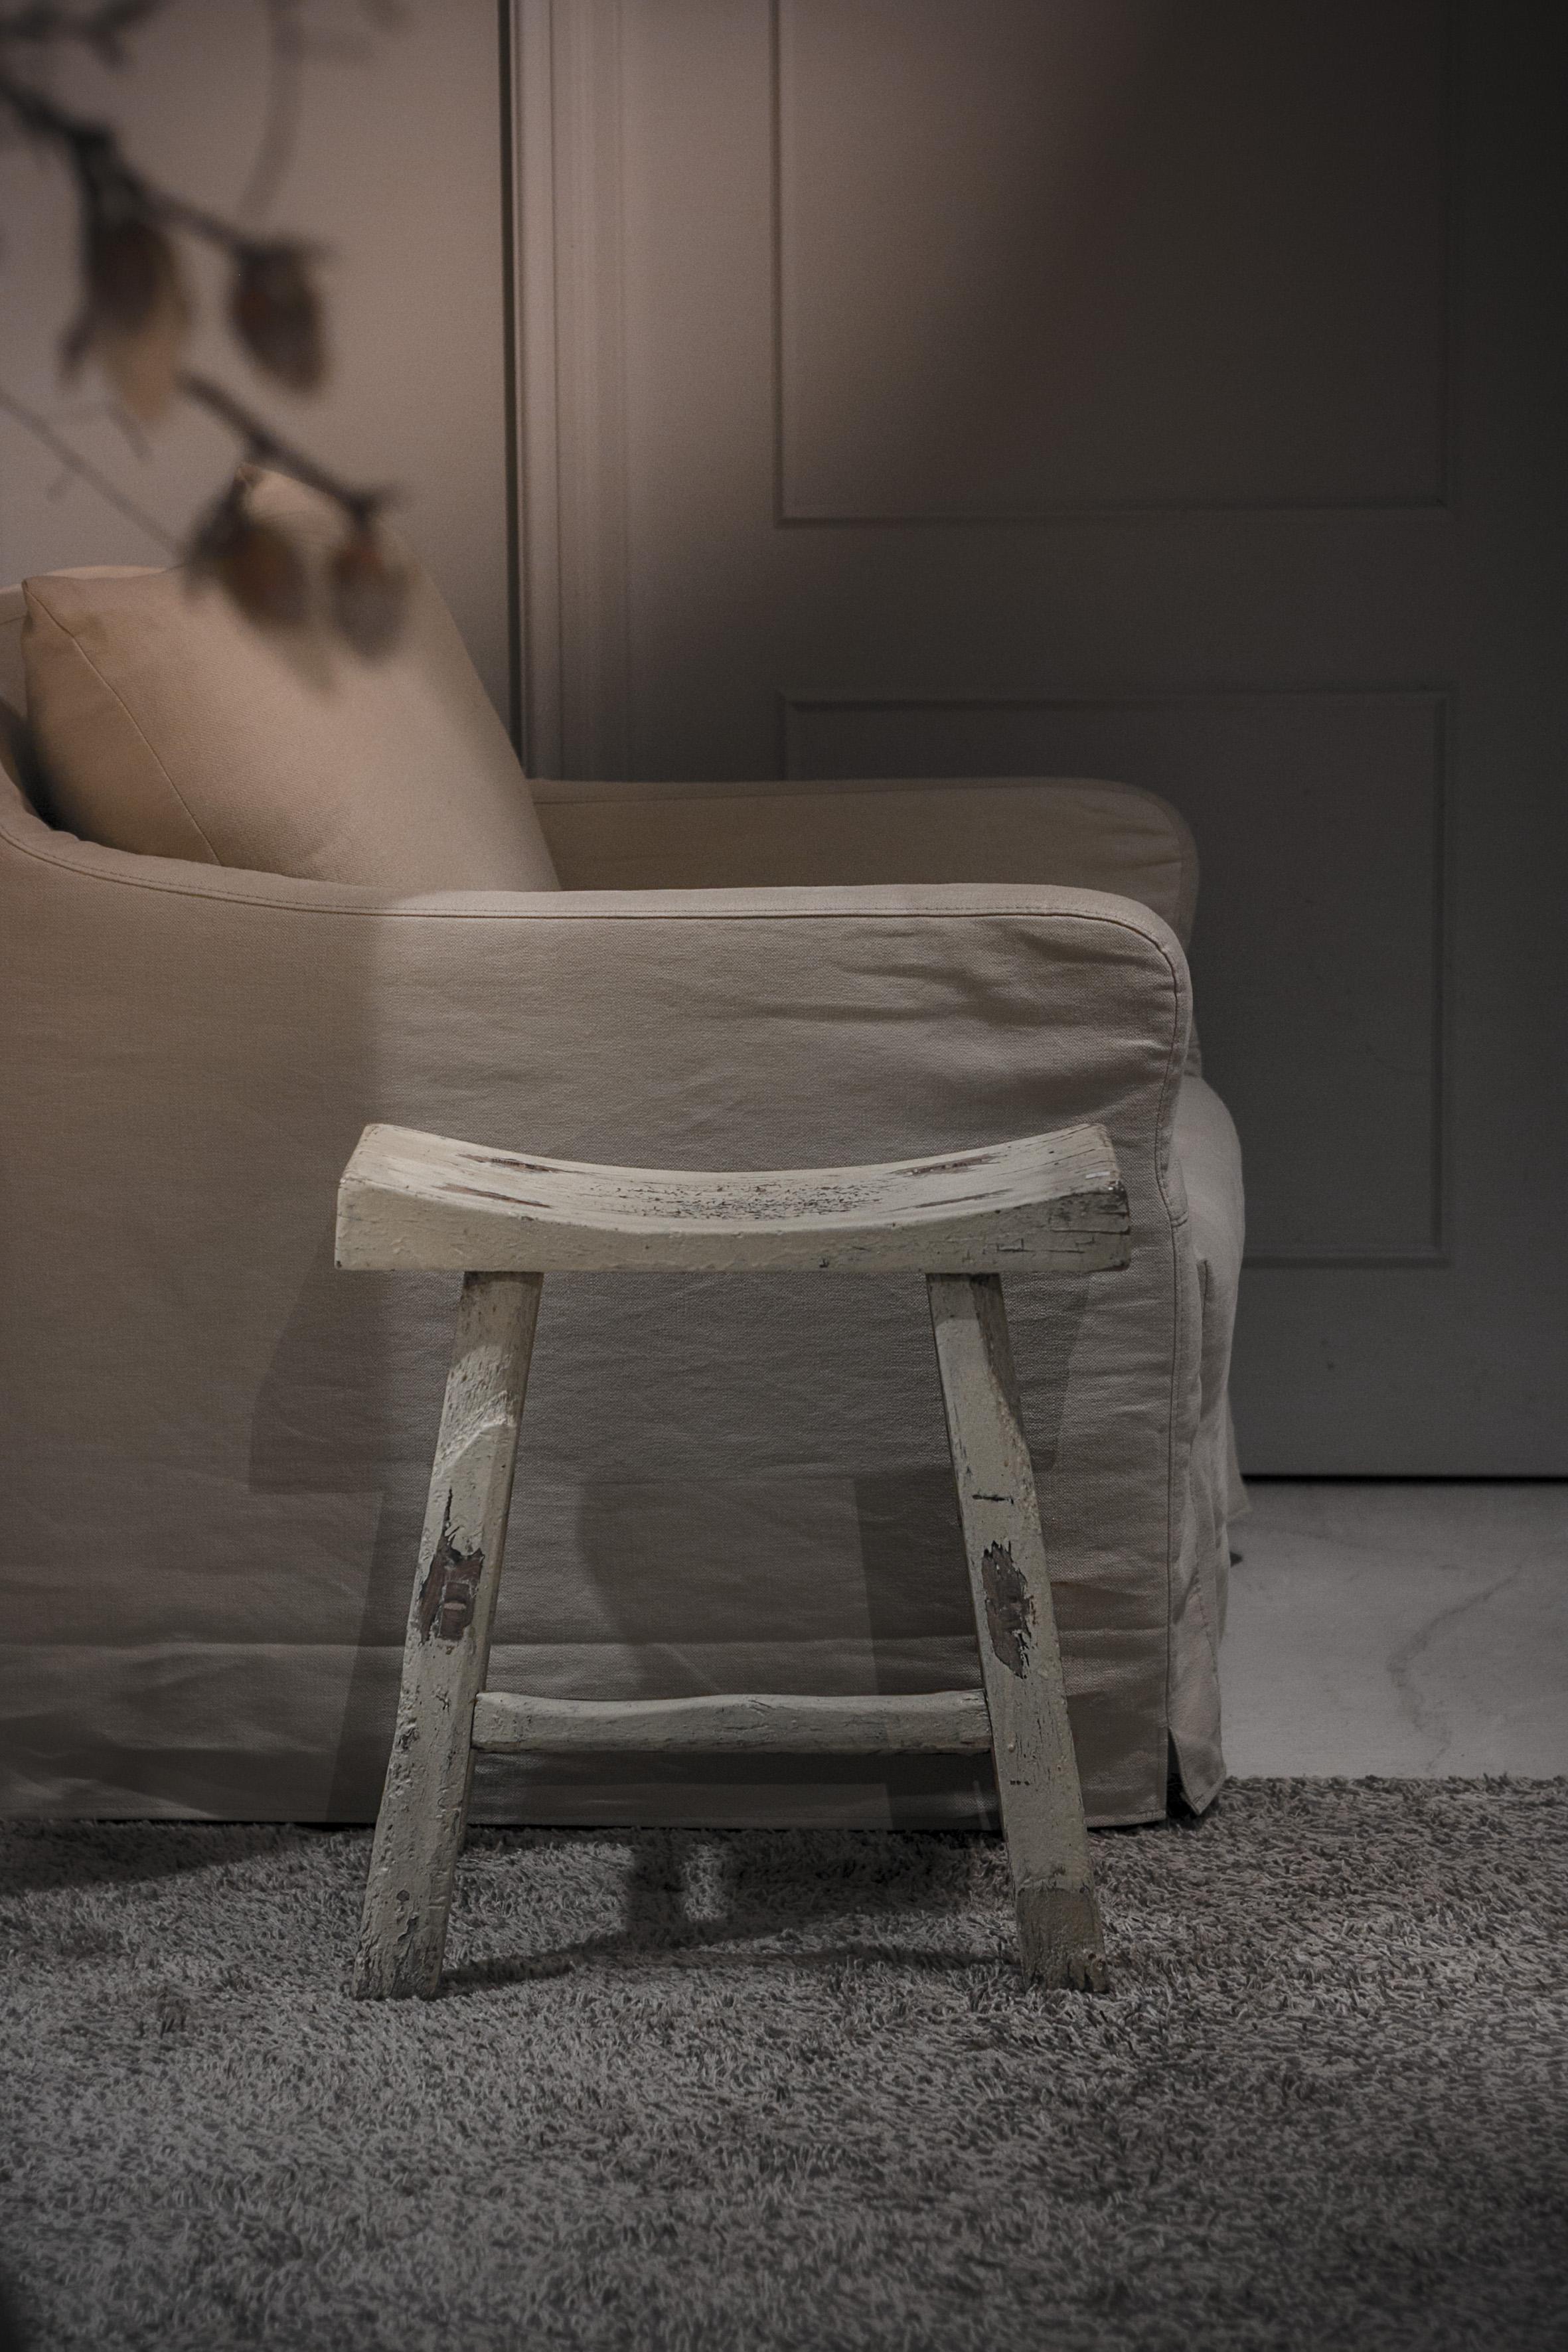 MartKleppe interieur shoot nov.2017_20171107_5110